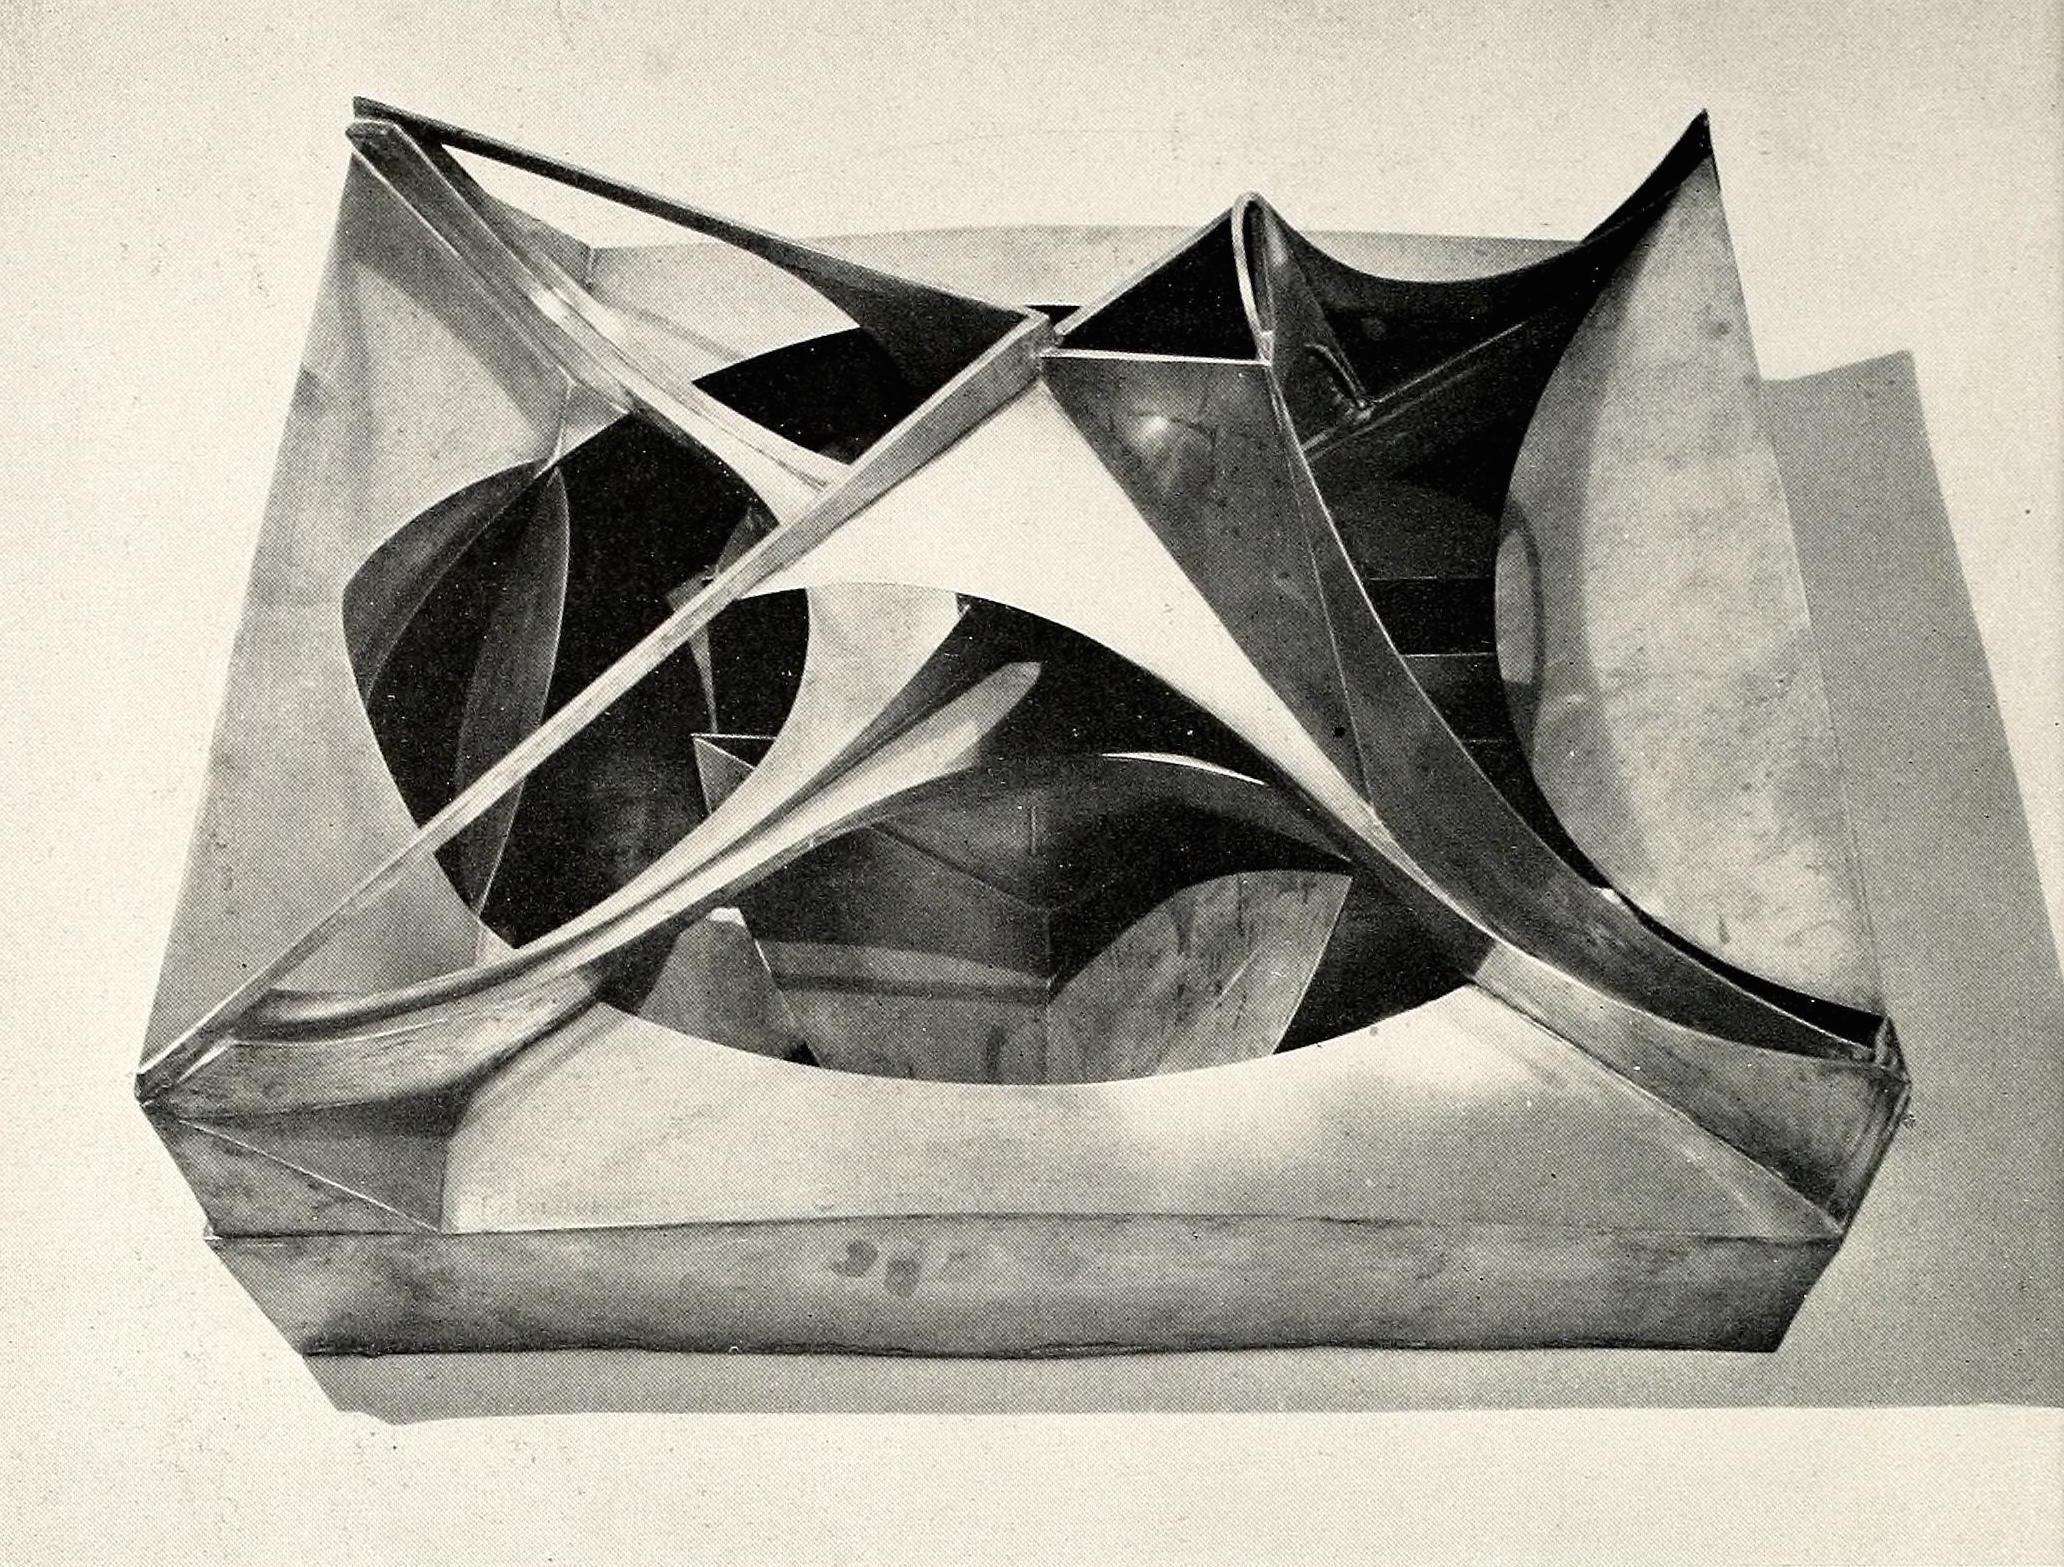 Naum Gabo, Abstraction (1927)